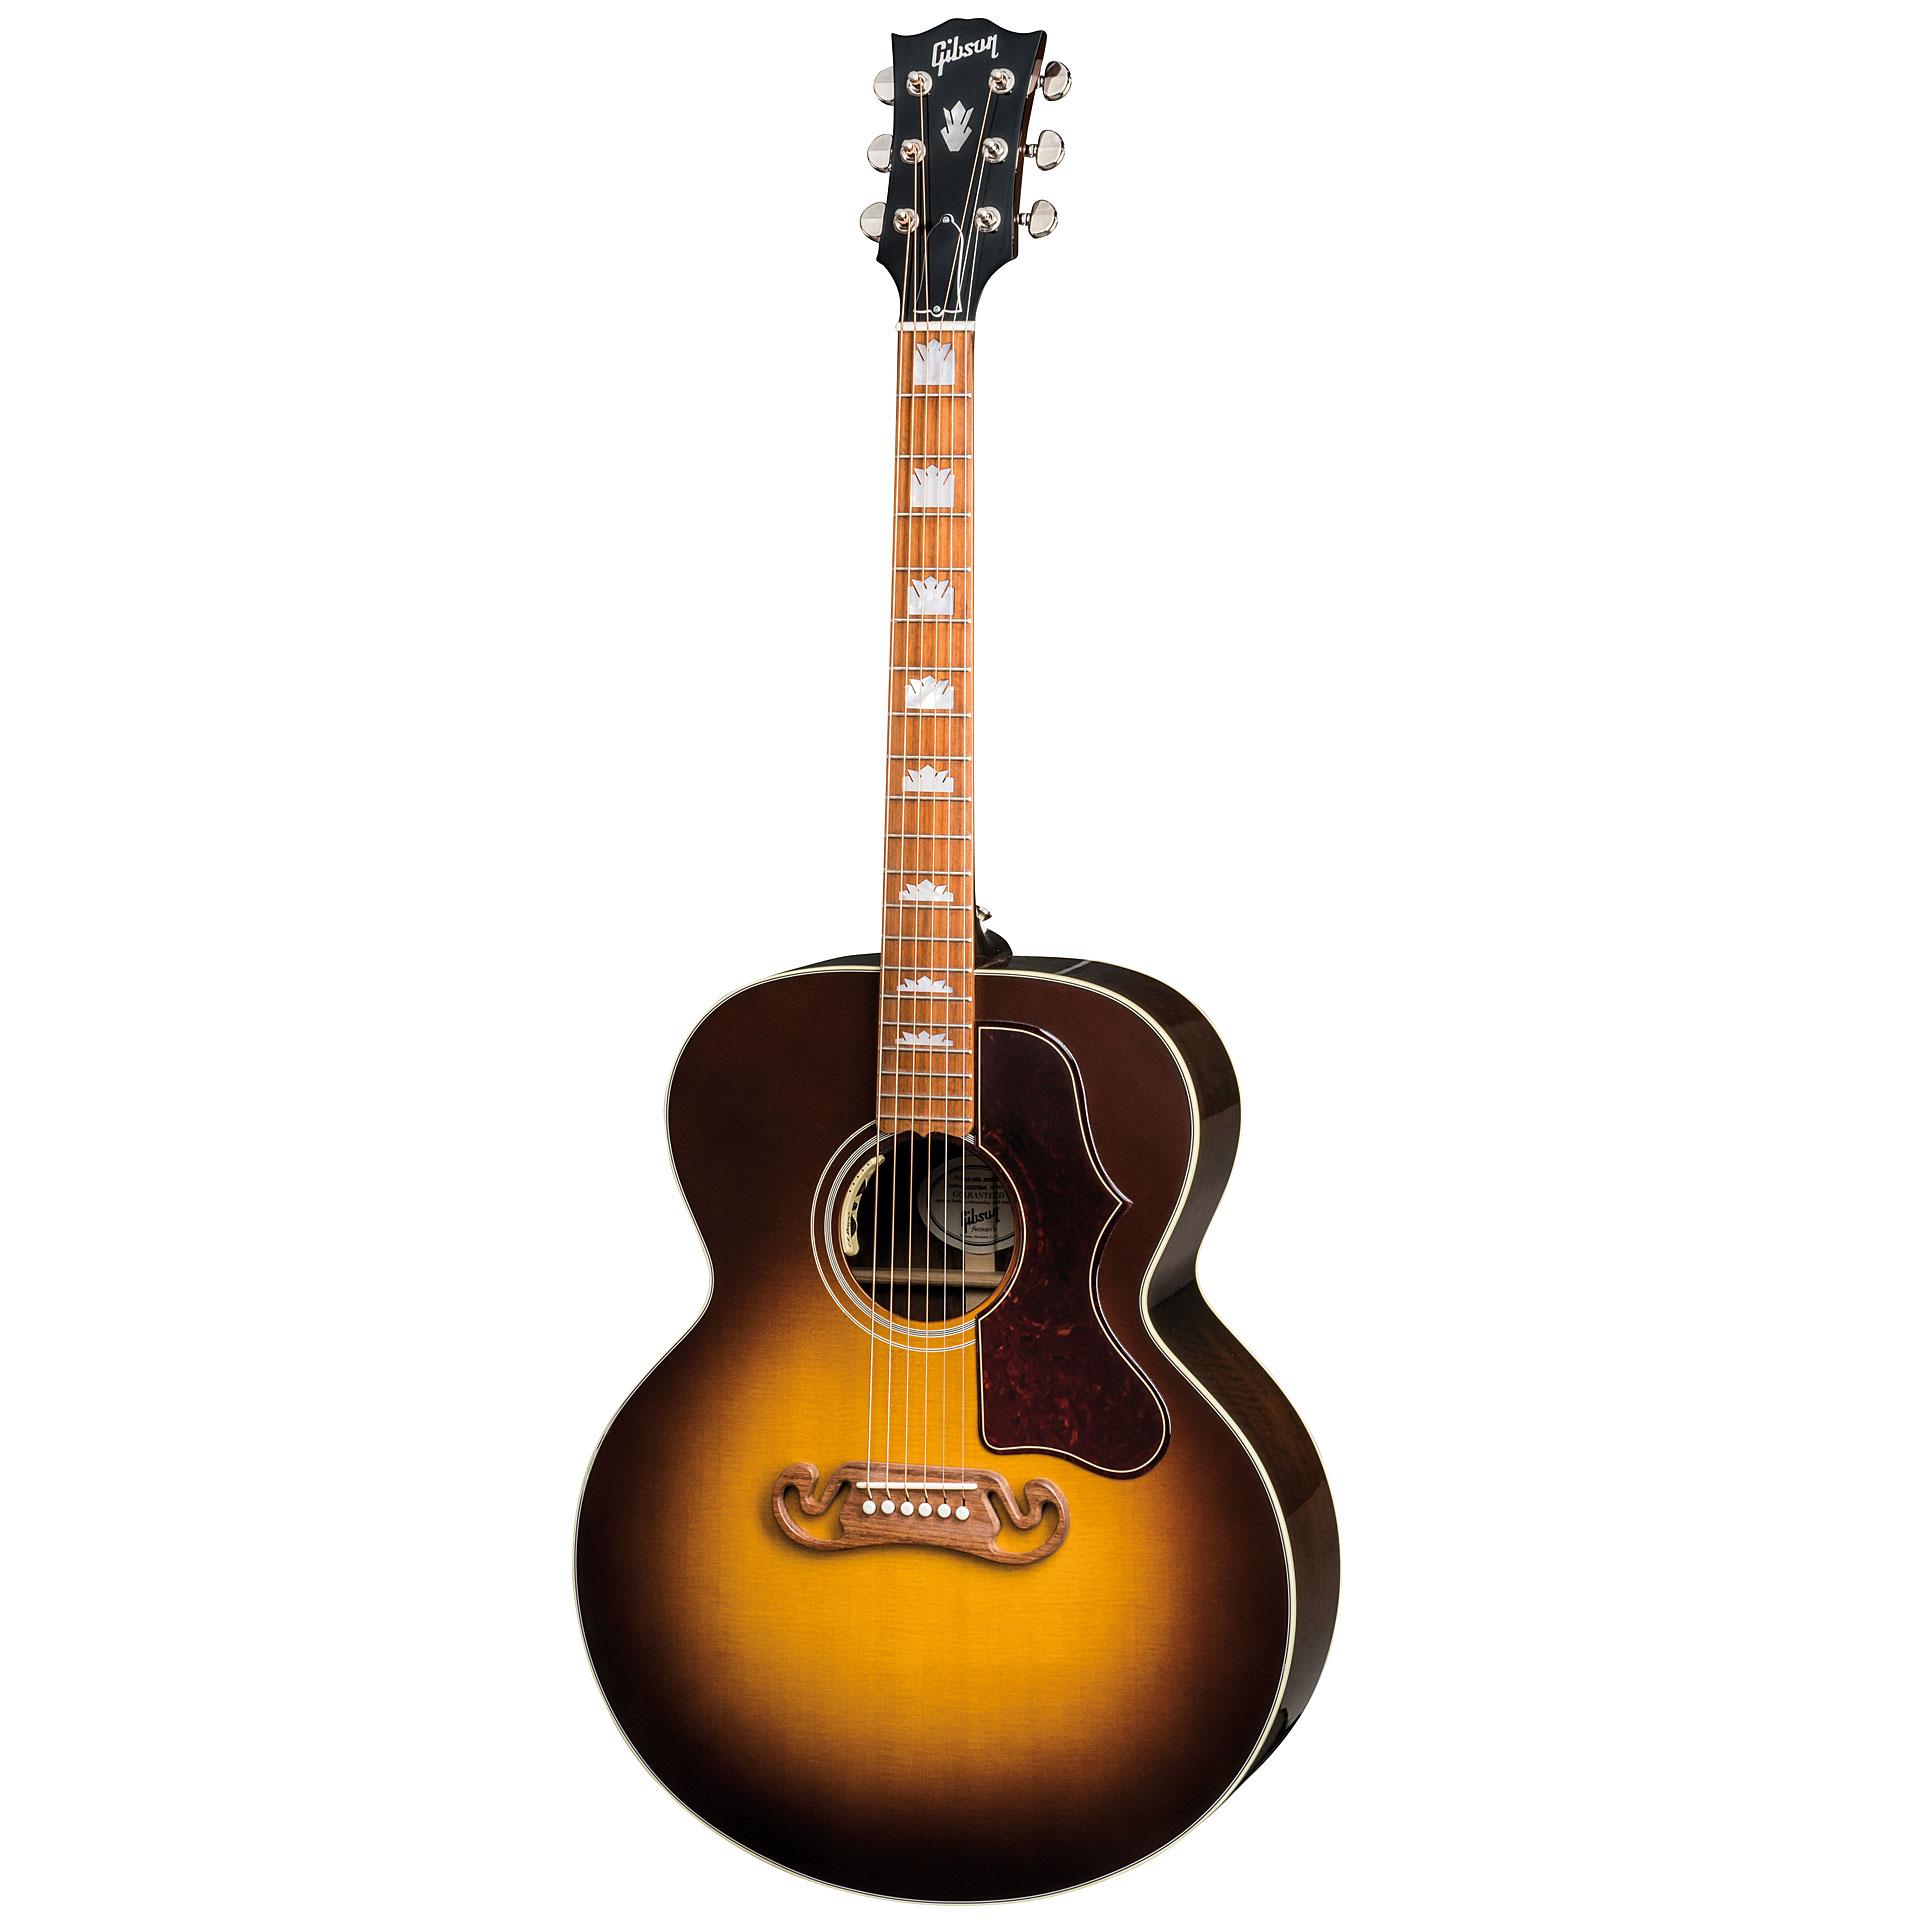 Gibson Sj 200 Studio 10104956 171 Acoustic Guitar